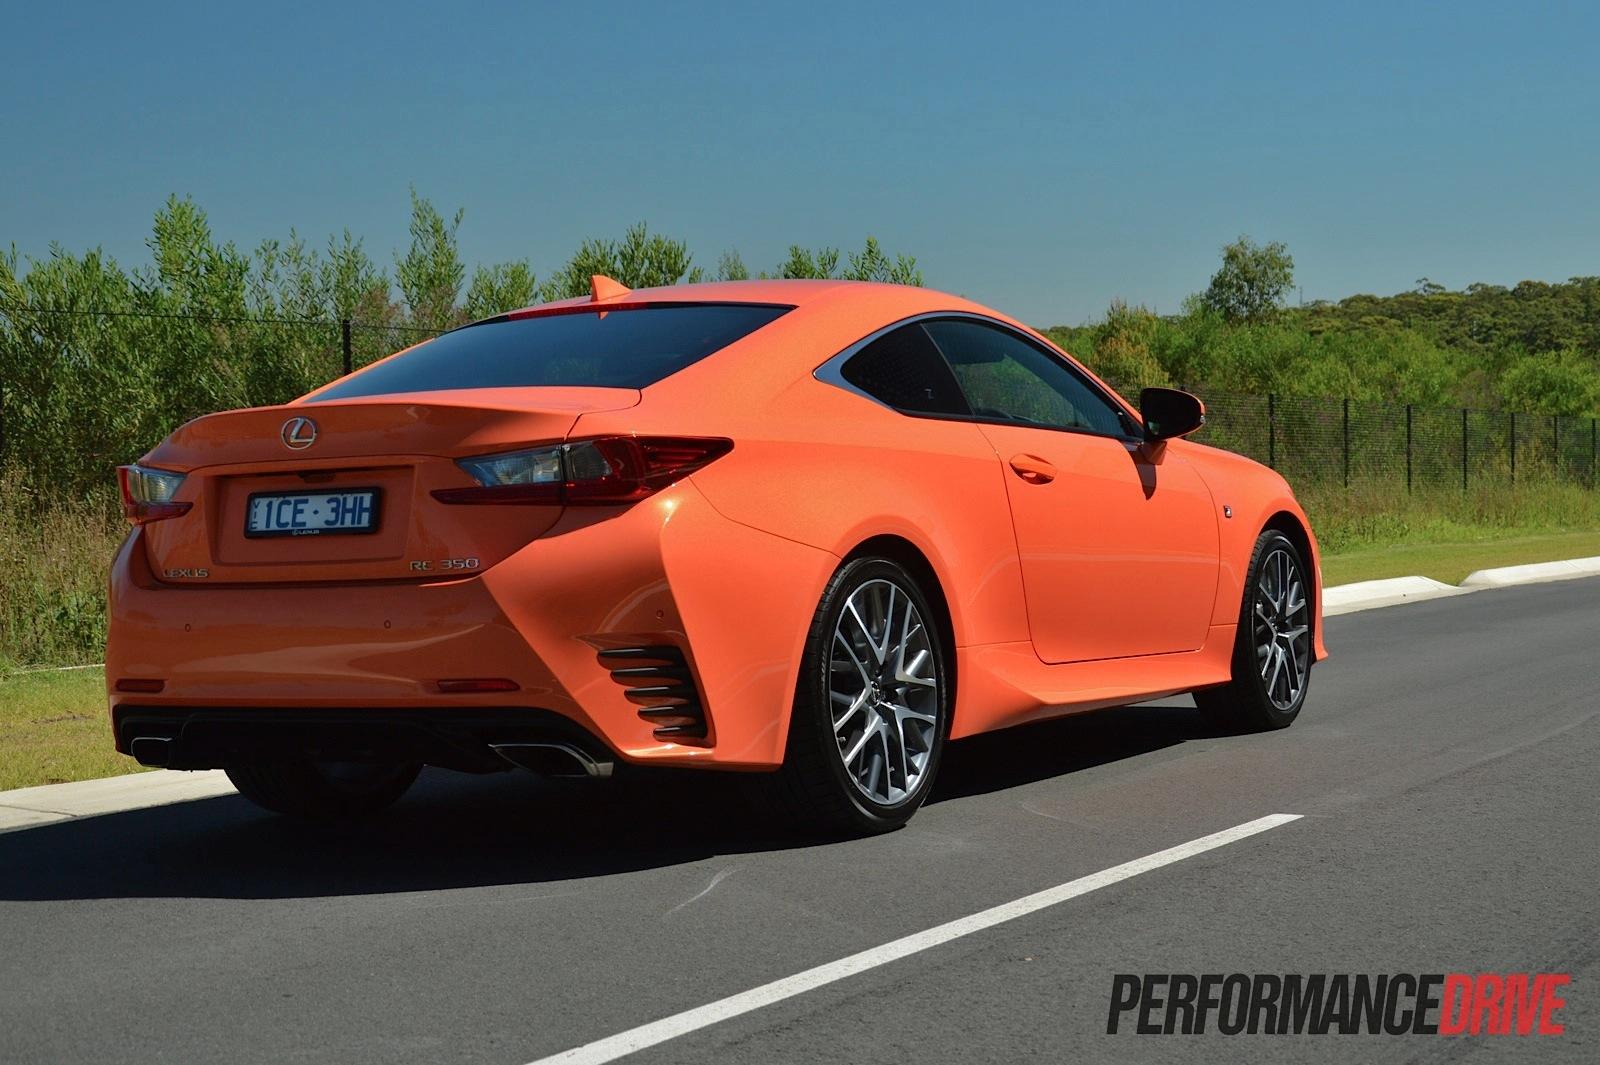 Lexus F Sport >> 2015 Lexus RC 350 F Sport review (video) | PerformanceDrive